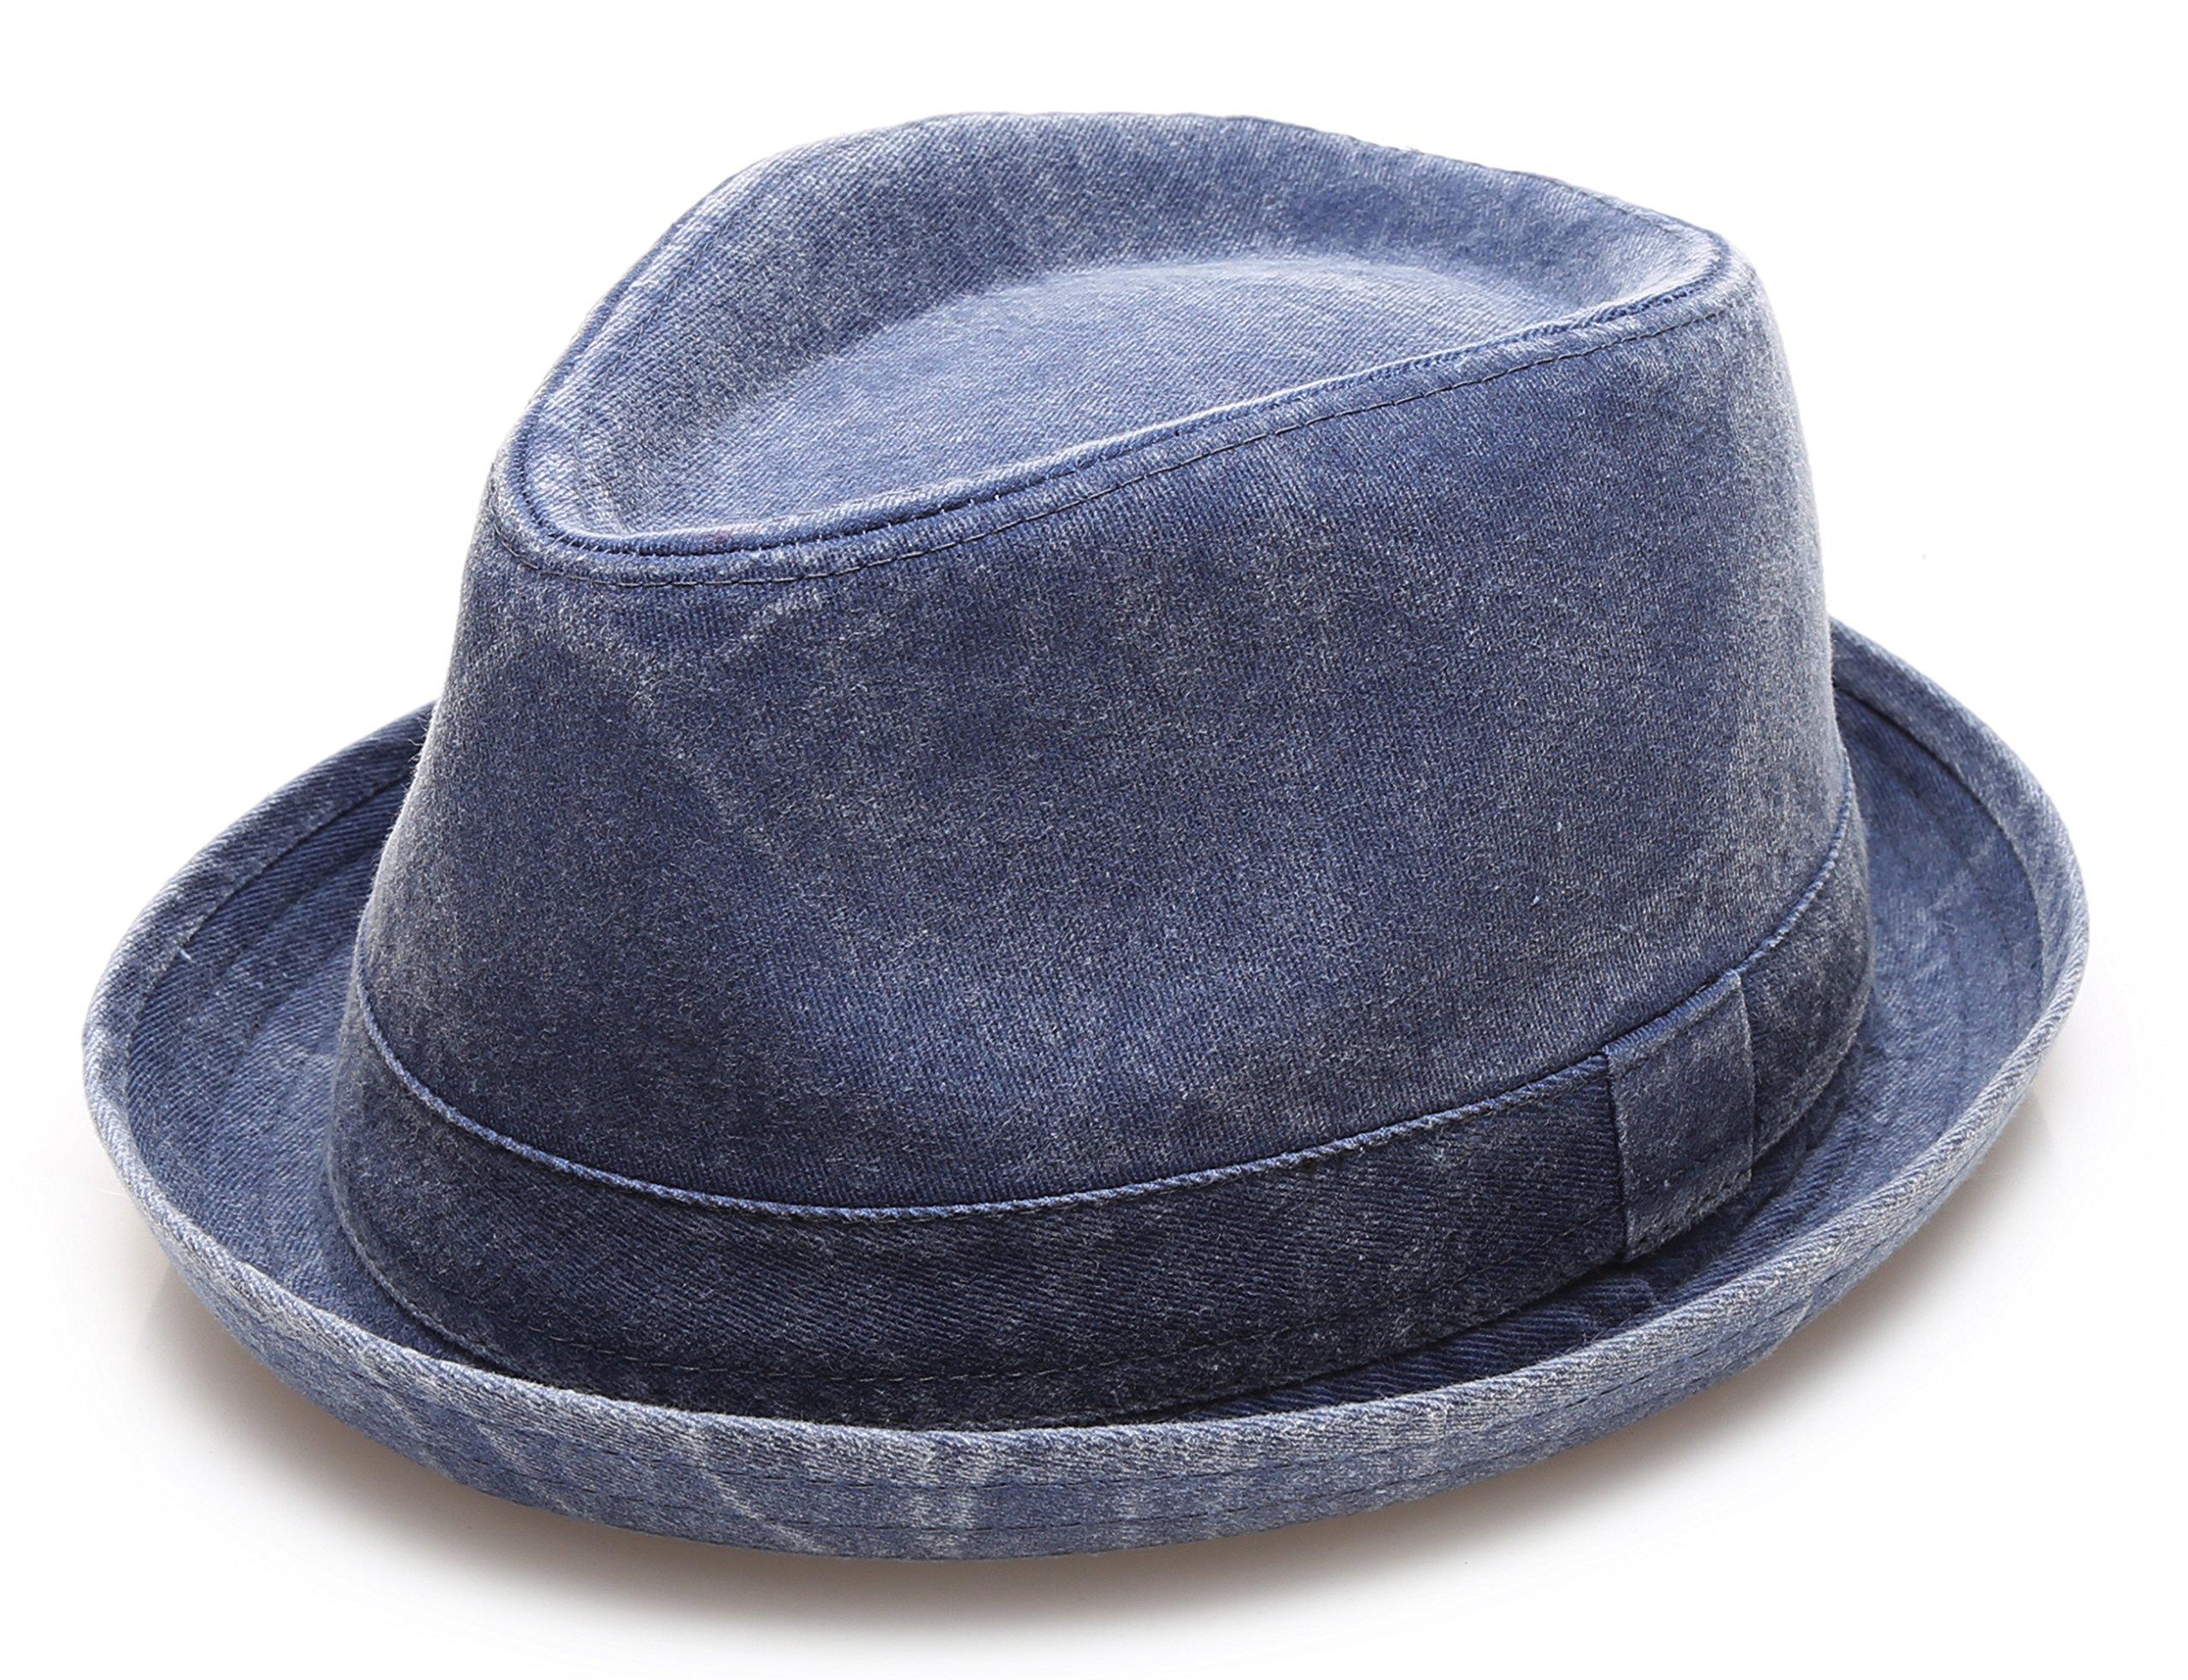 Men's Denim Washed Cotton Casual Vintage Style Fedora Sun Hat (Denim,ML)